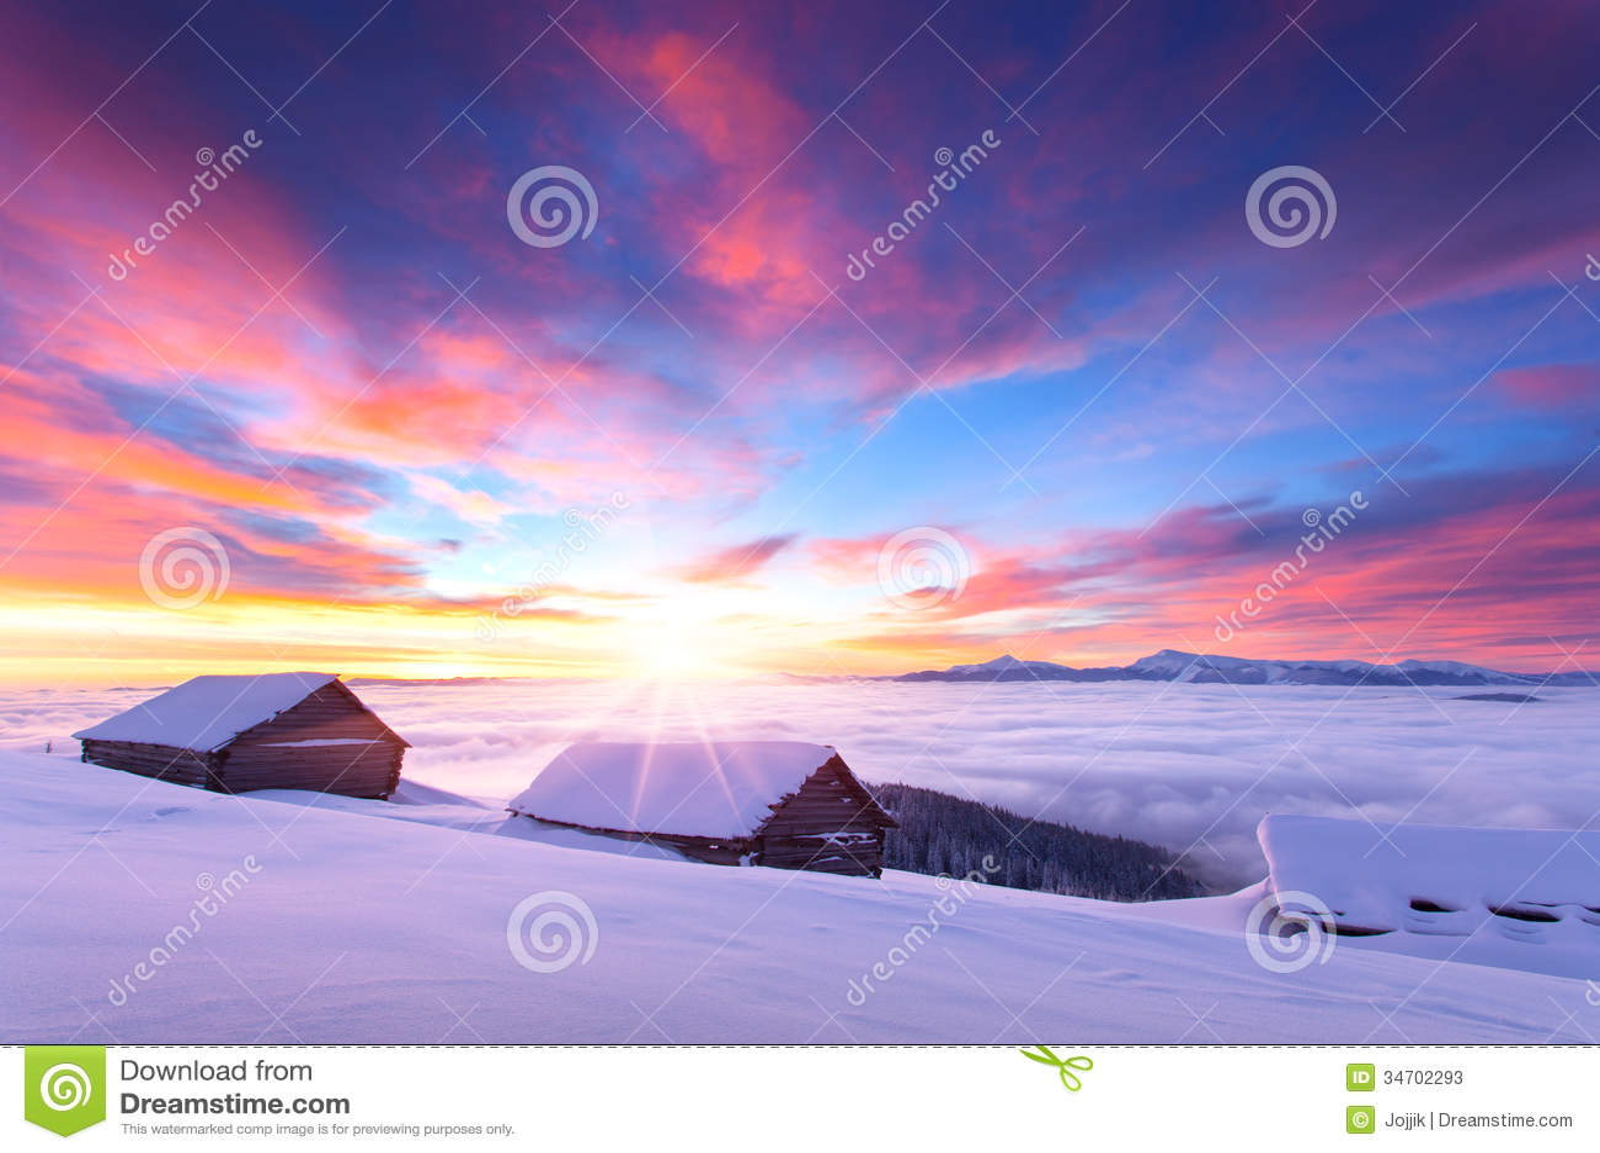 Niagara Falls Wallpaper Free Download Colorful Winter Sunrise In The Carpathian Mountains Stock